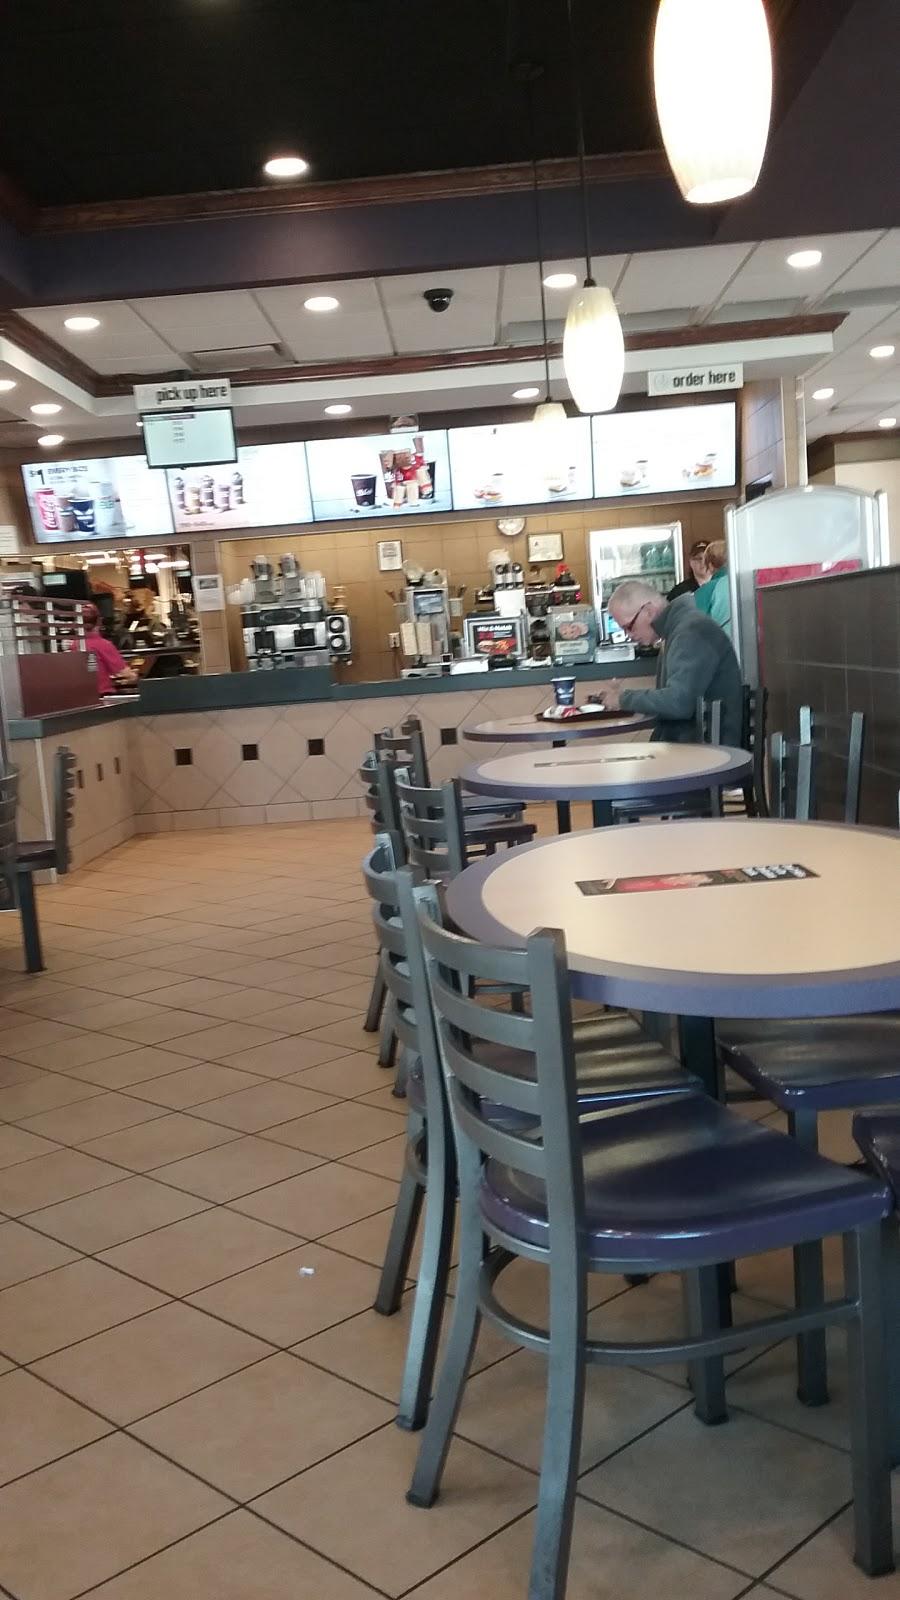 McDonalds - cafe  | Photo 4 of 10 | Address: 350 S Cannon Blvd, Kannapolis, NC 28081, USA | Phone: (704) 933-9554